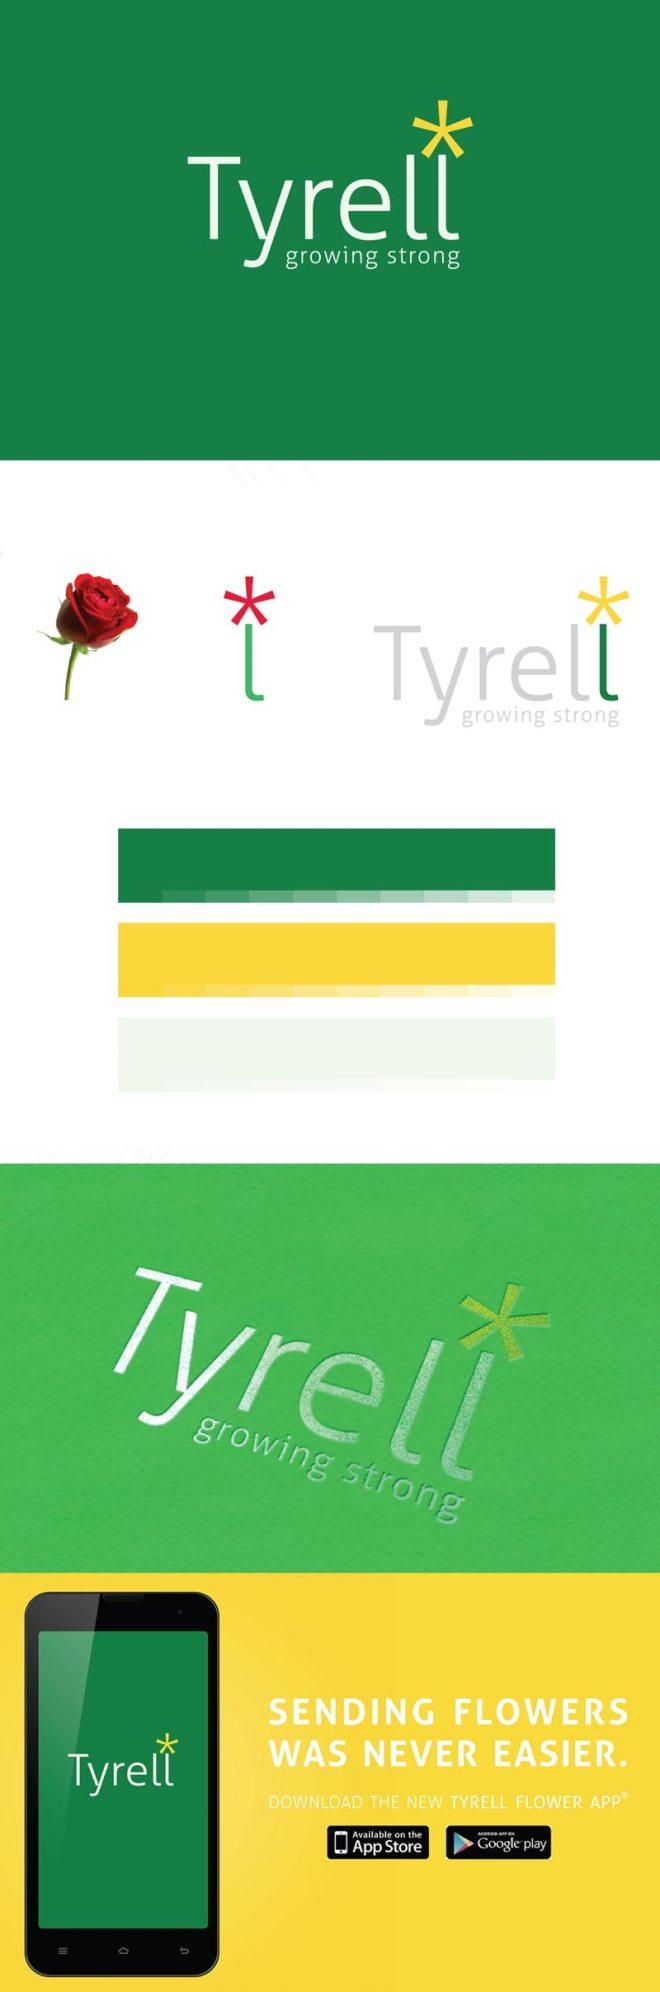 Tyrell Flowers